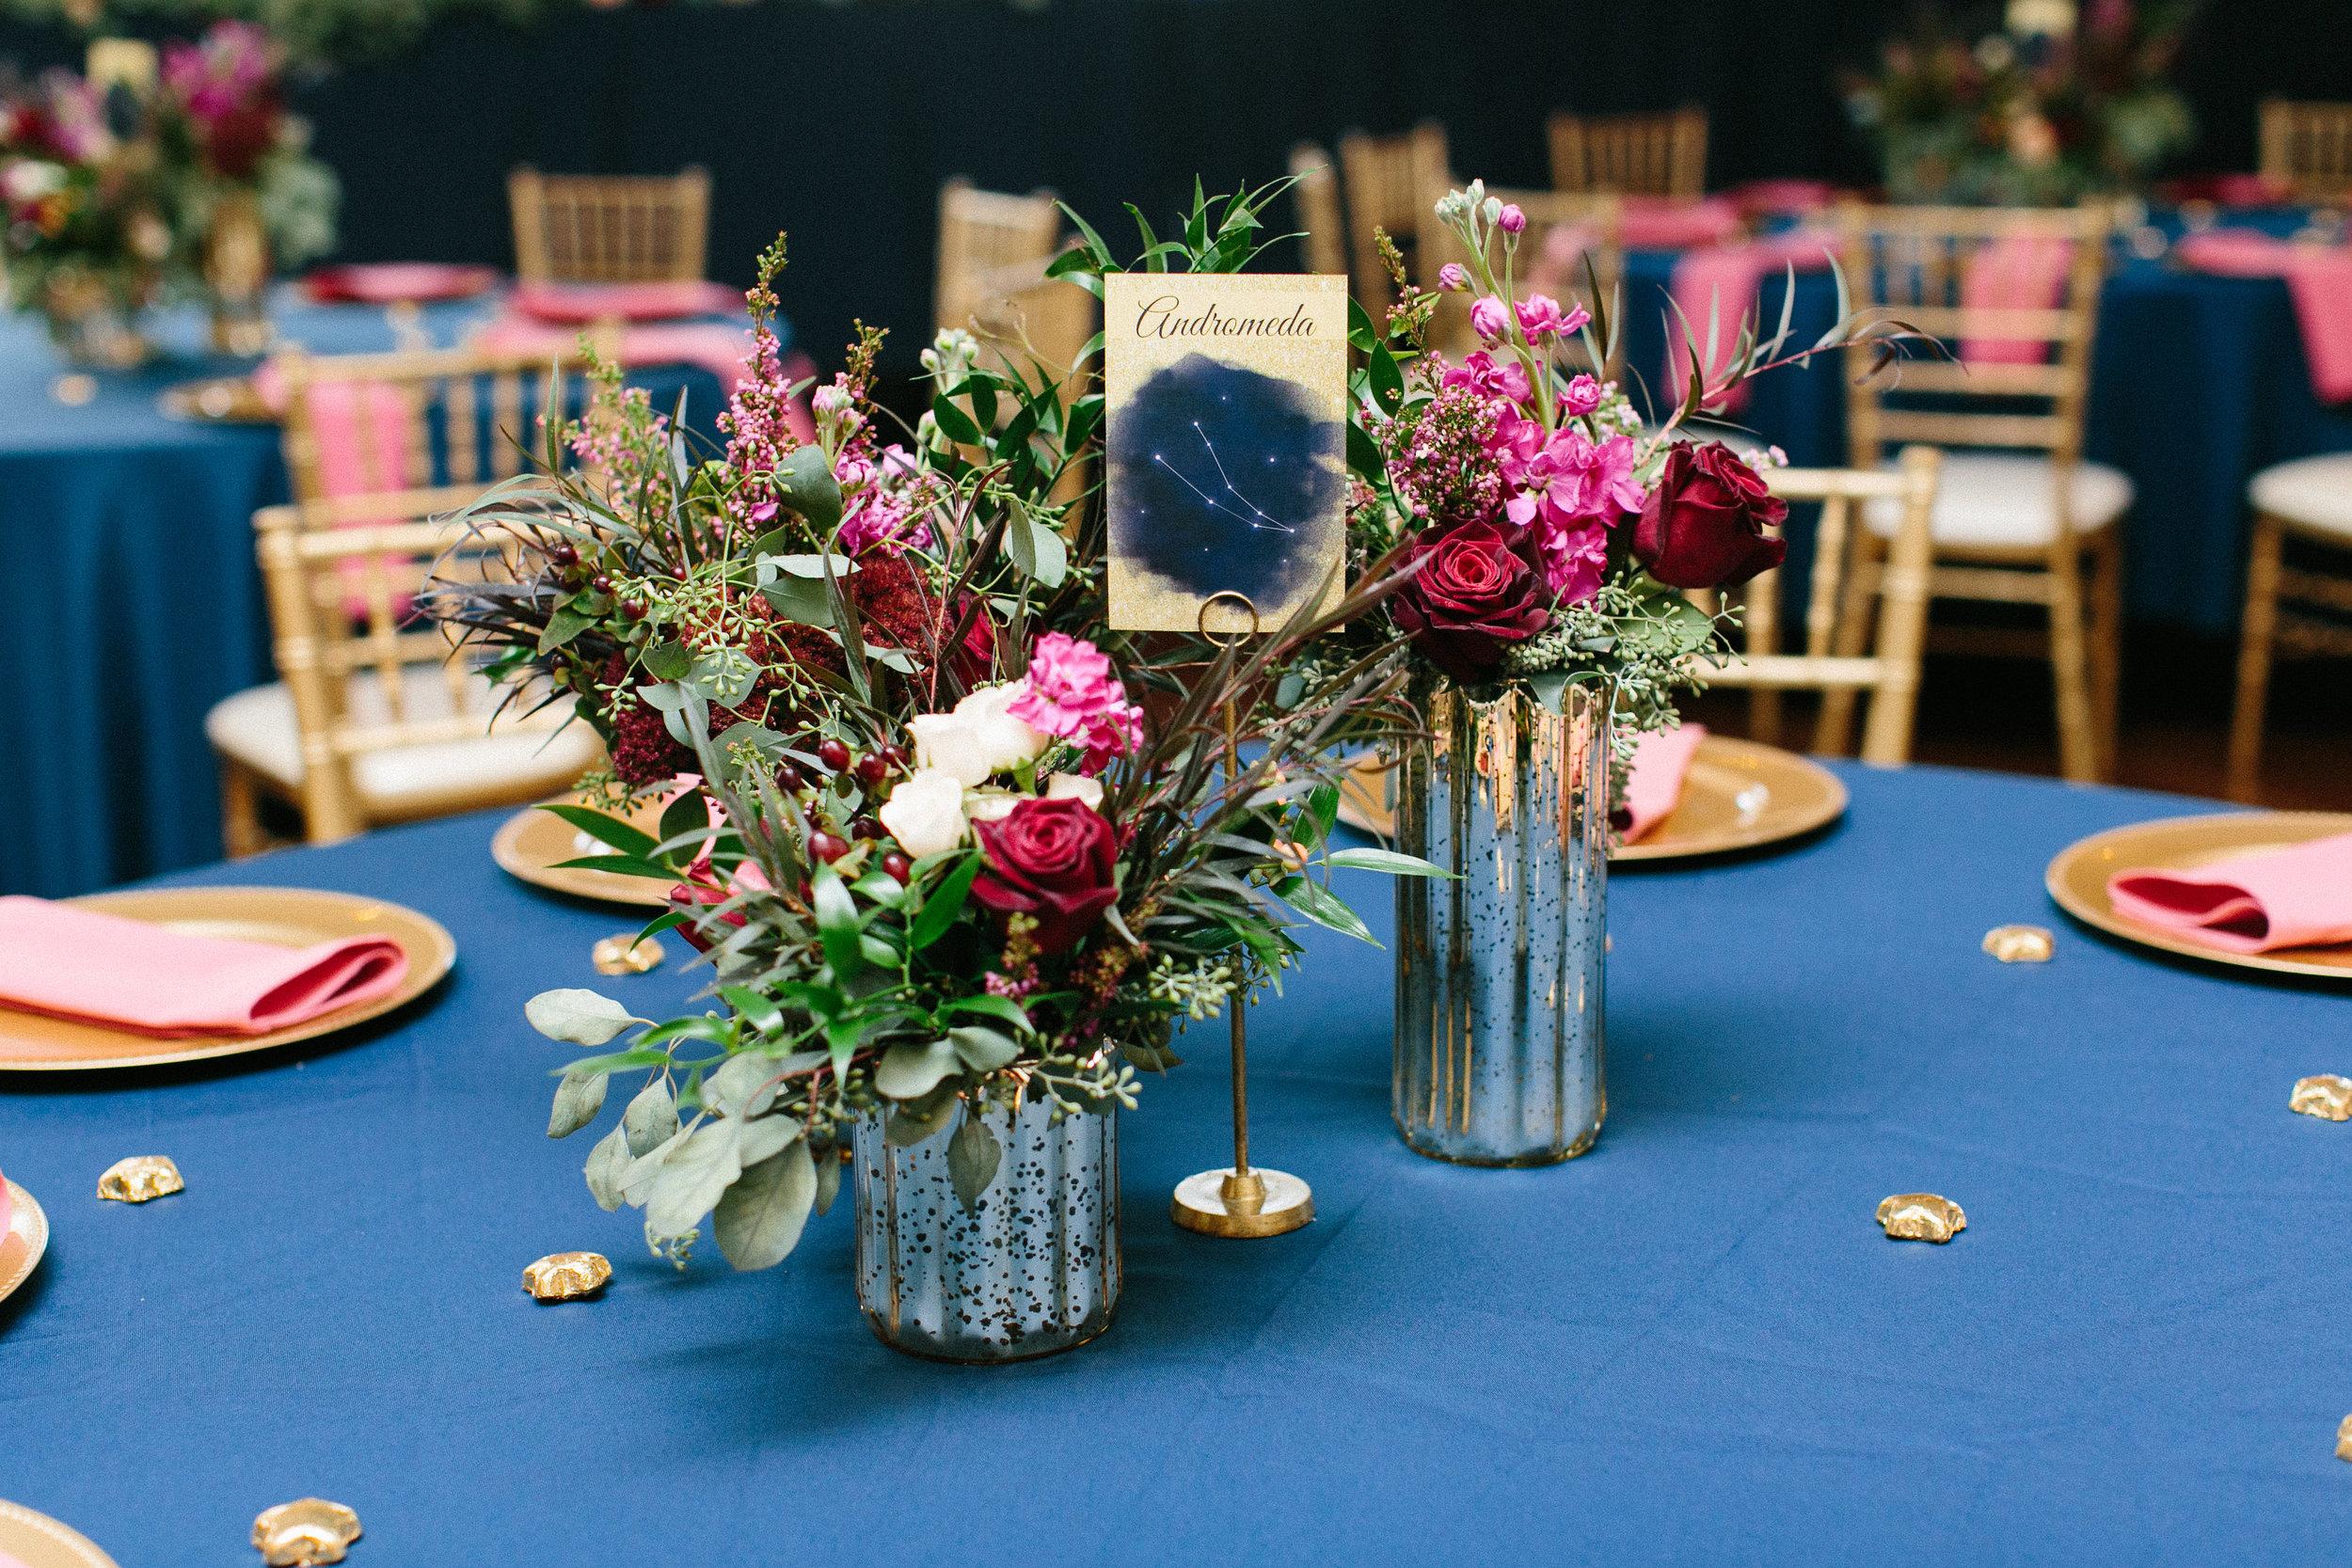 2017_Carly_Milbrath_Jefferson_Street_Inn_Wedding_Wausau_WI_019.JPG